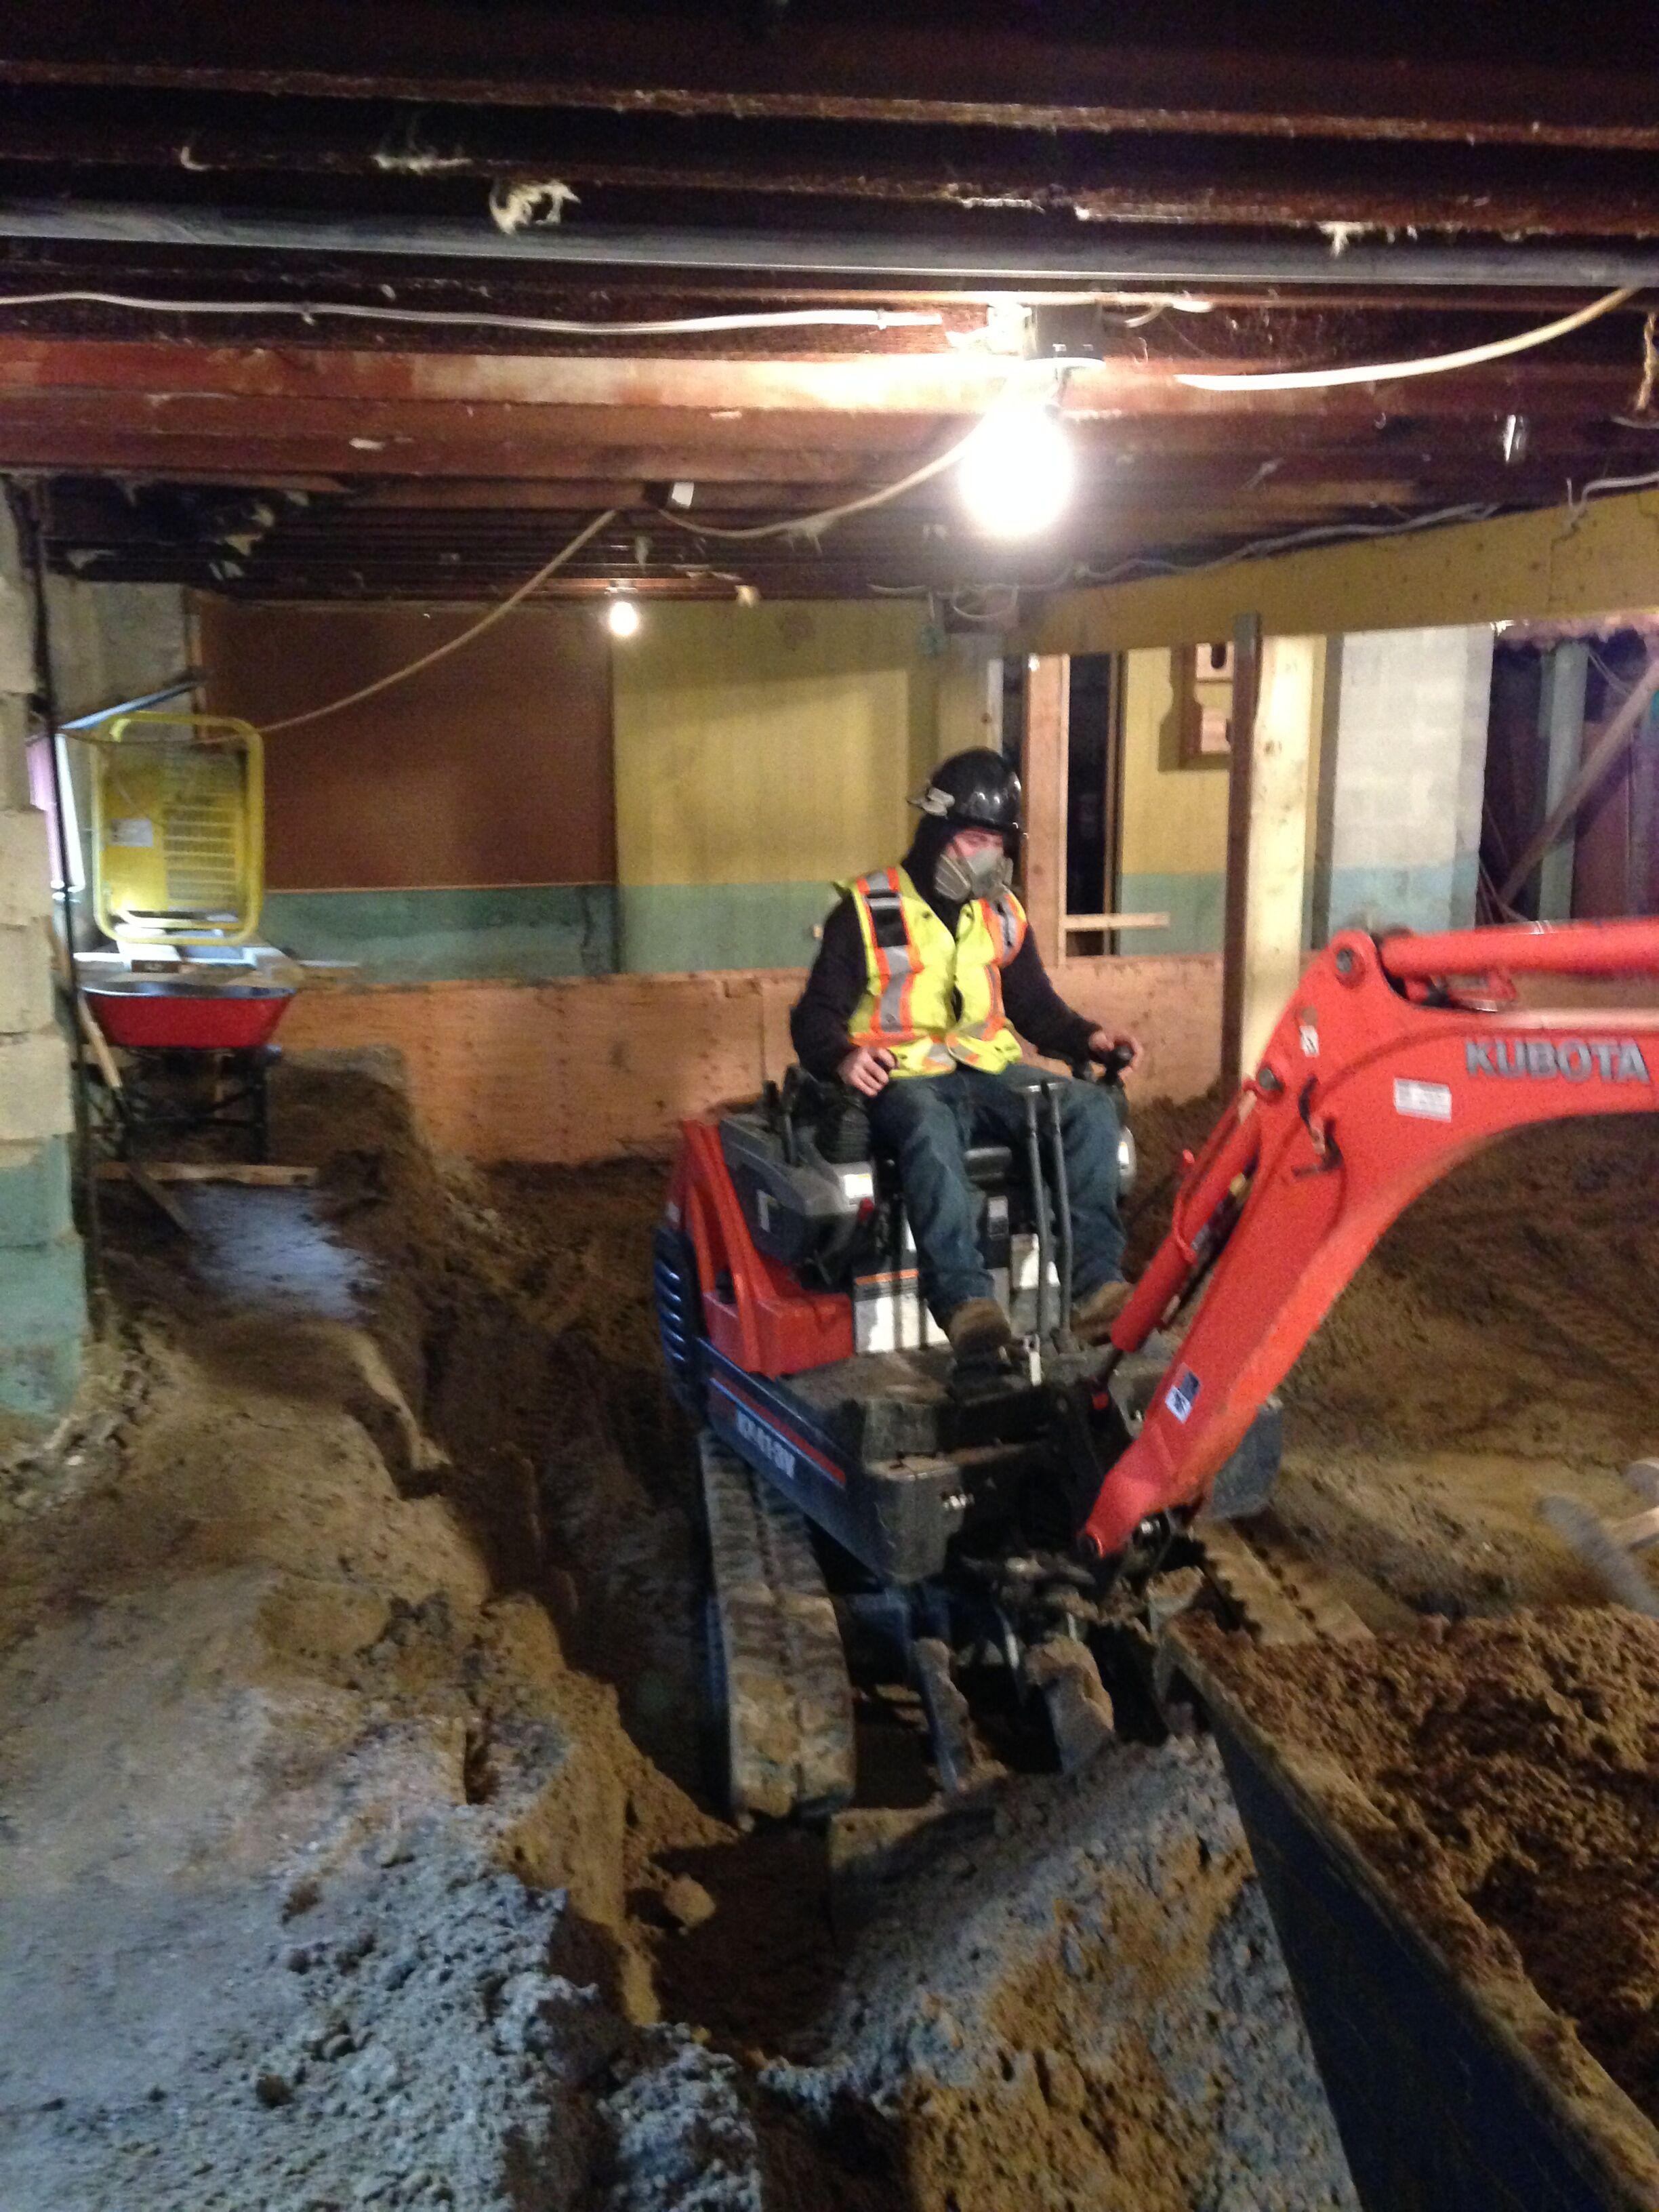 Kubota KX018 Excavator